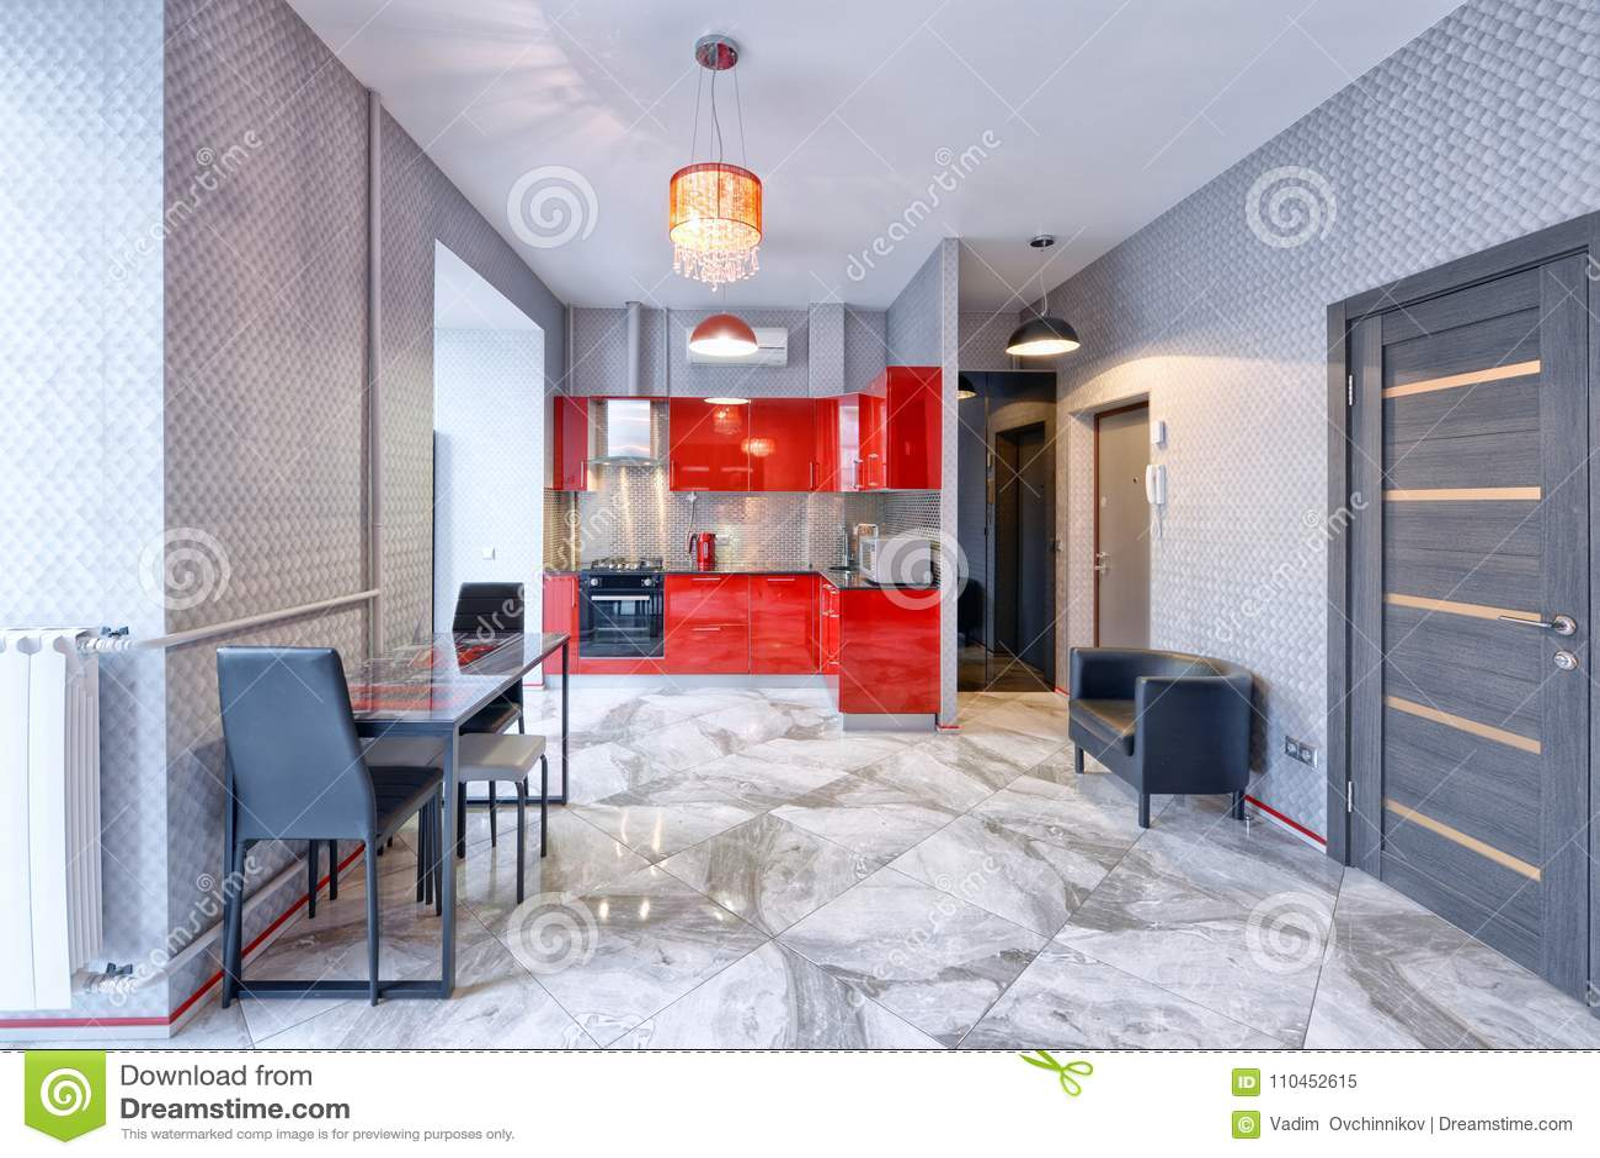 kitchen curtains for sale led ceiling lighting 厨房内部在红颜色现代房子里库存图片 图片包括有窗帘 平面 设计 光滑 厨房内部在红颜色现代房子里